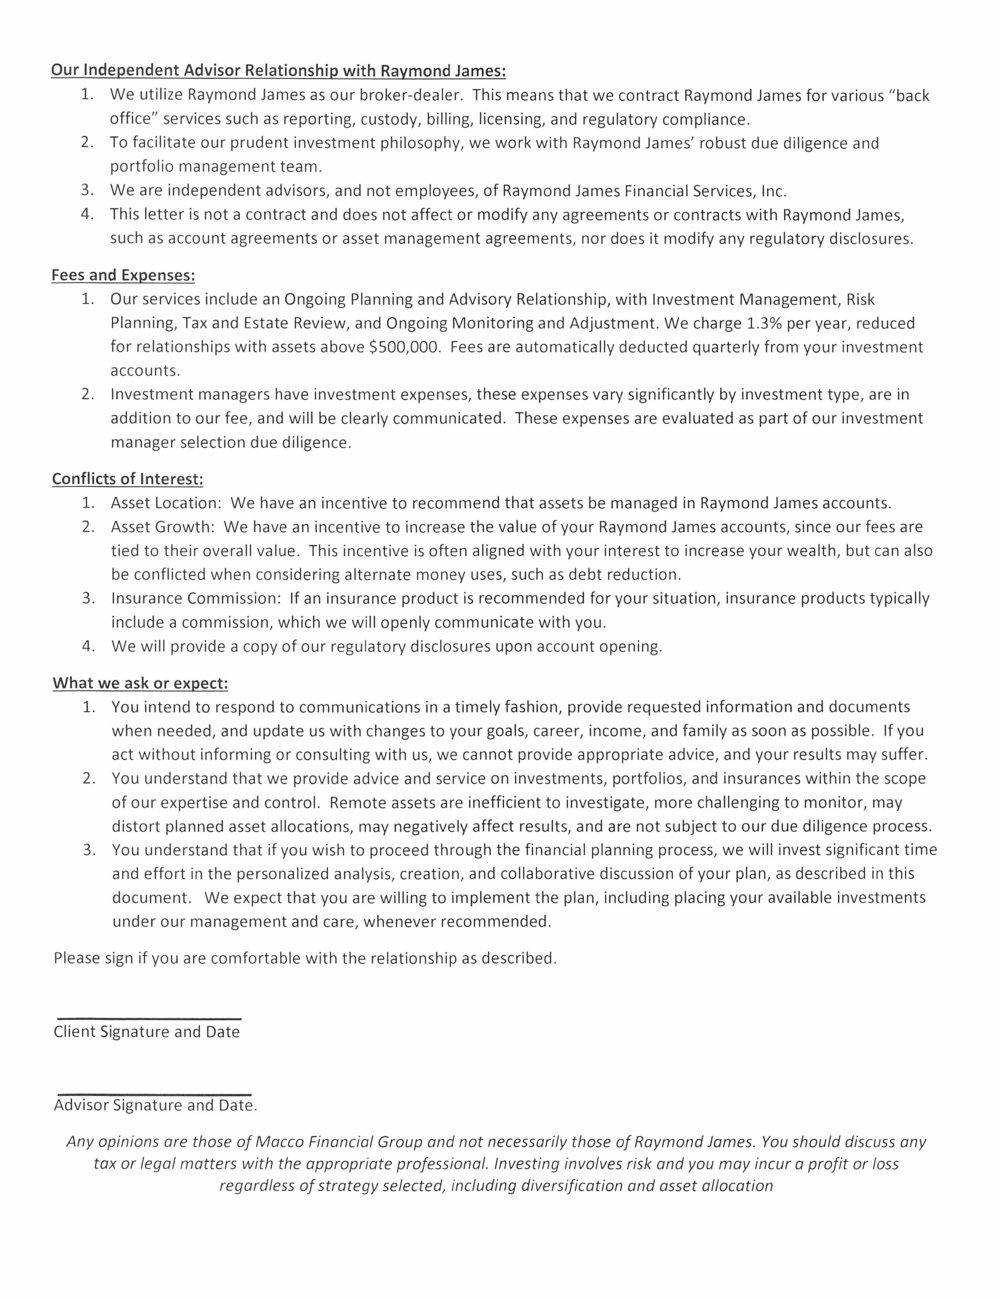 Client Engagement Letter Page 2.jpg